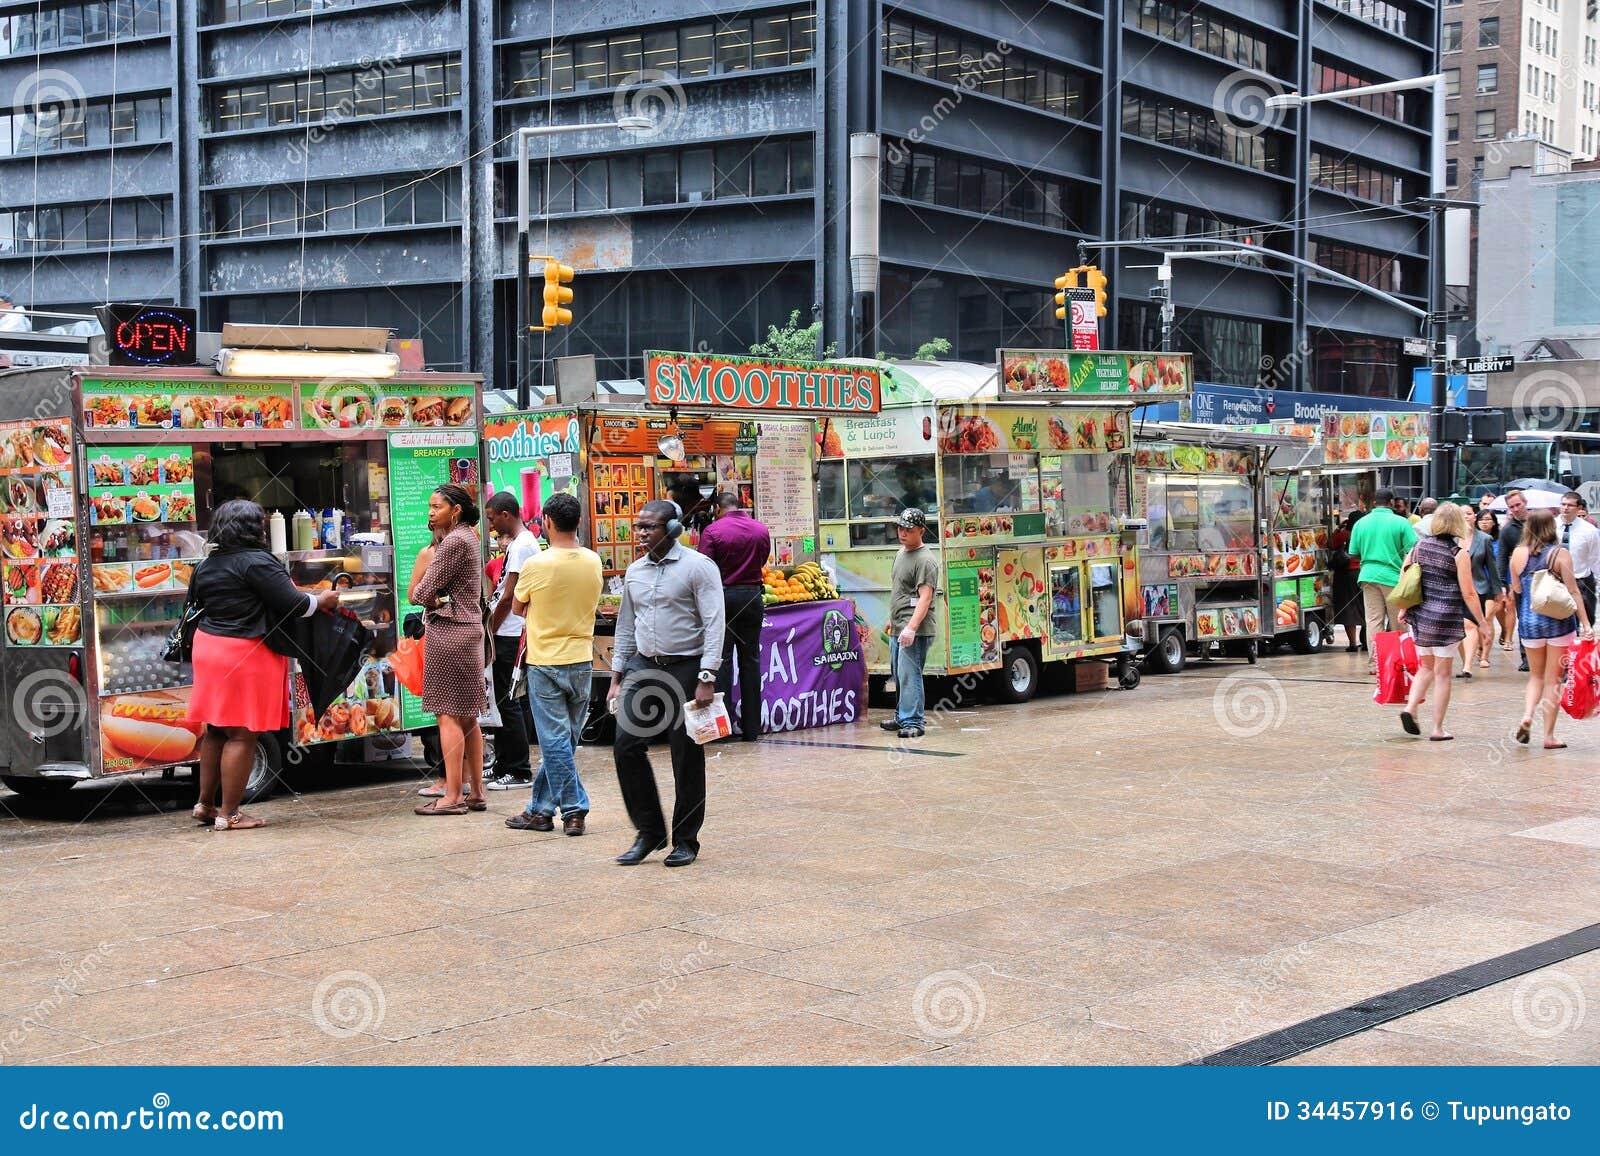 Food trucks, New York